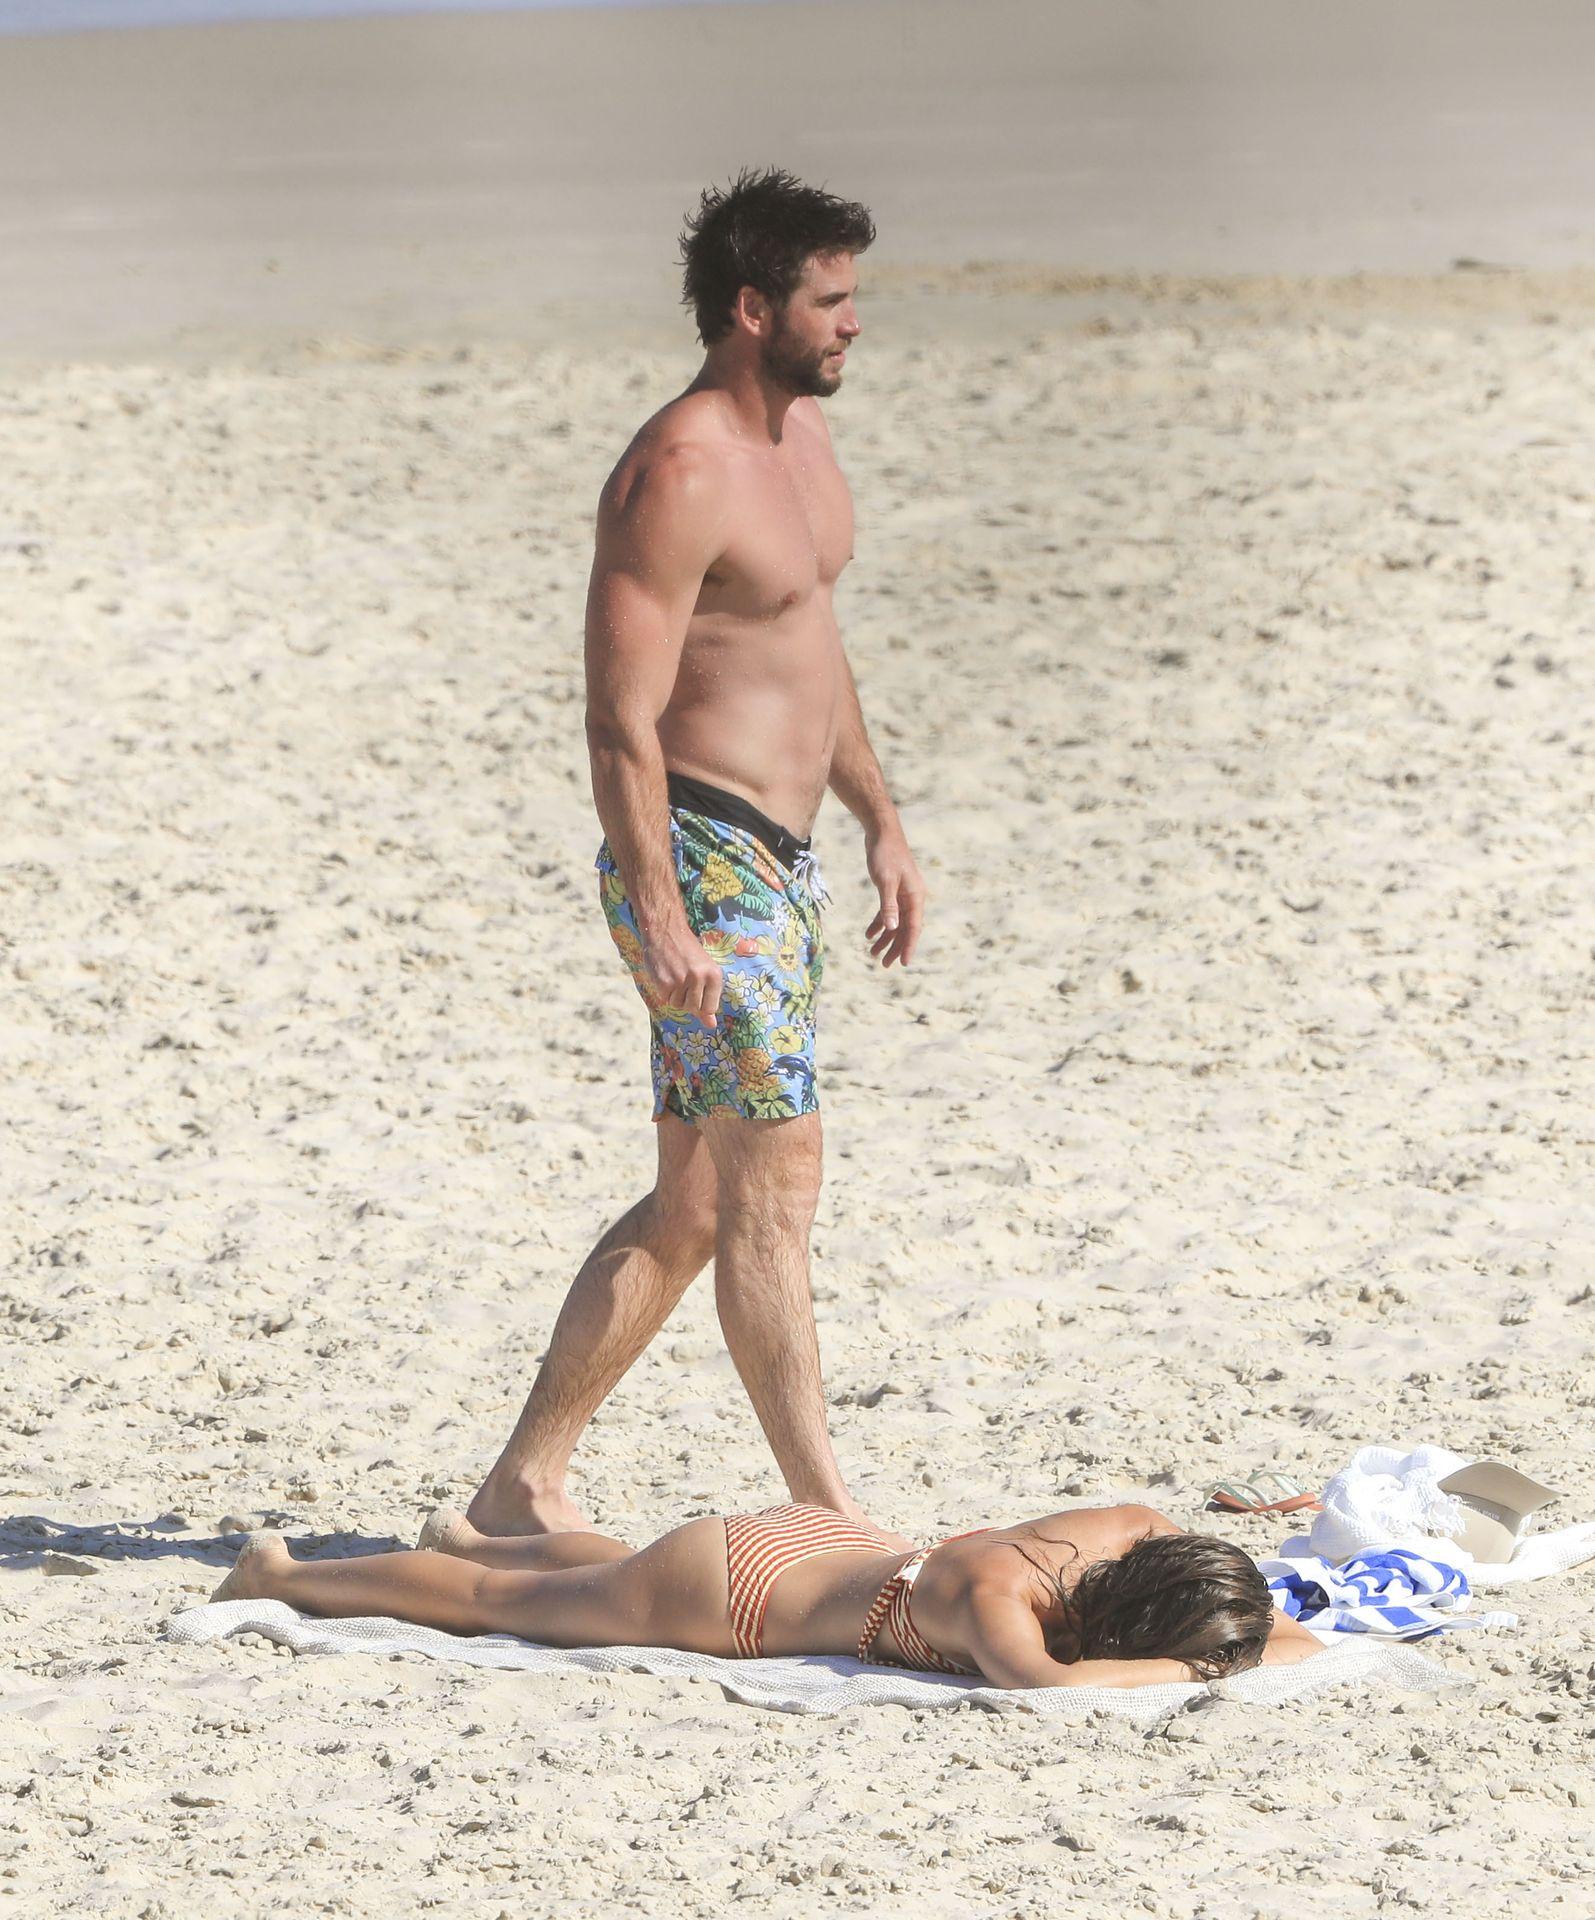 Gabriella Brooks Hot – Liam Hemsworth's New Girlfriend 0032